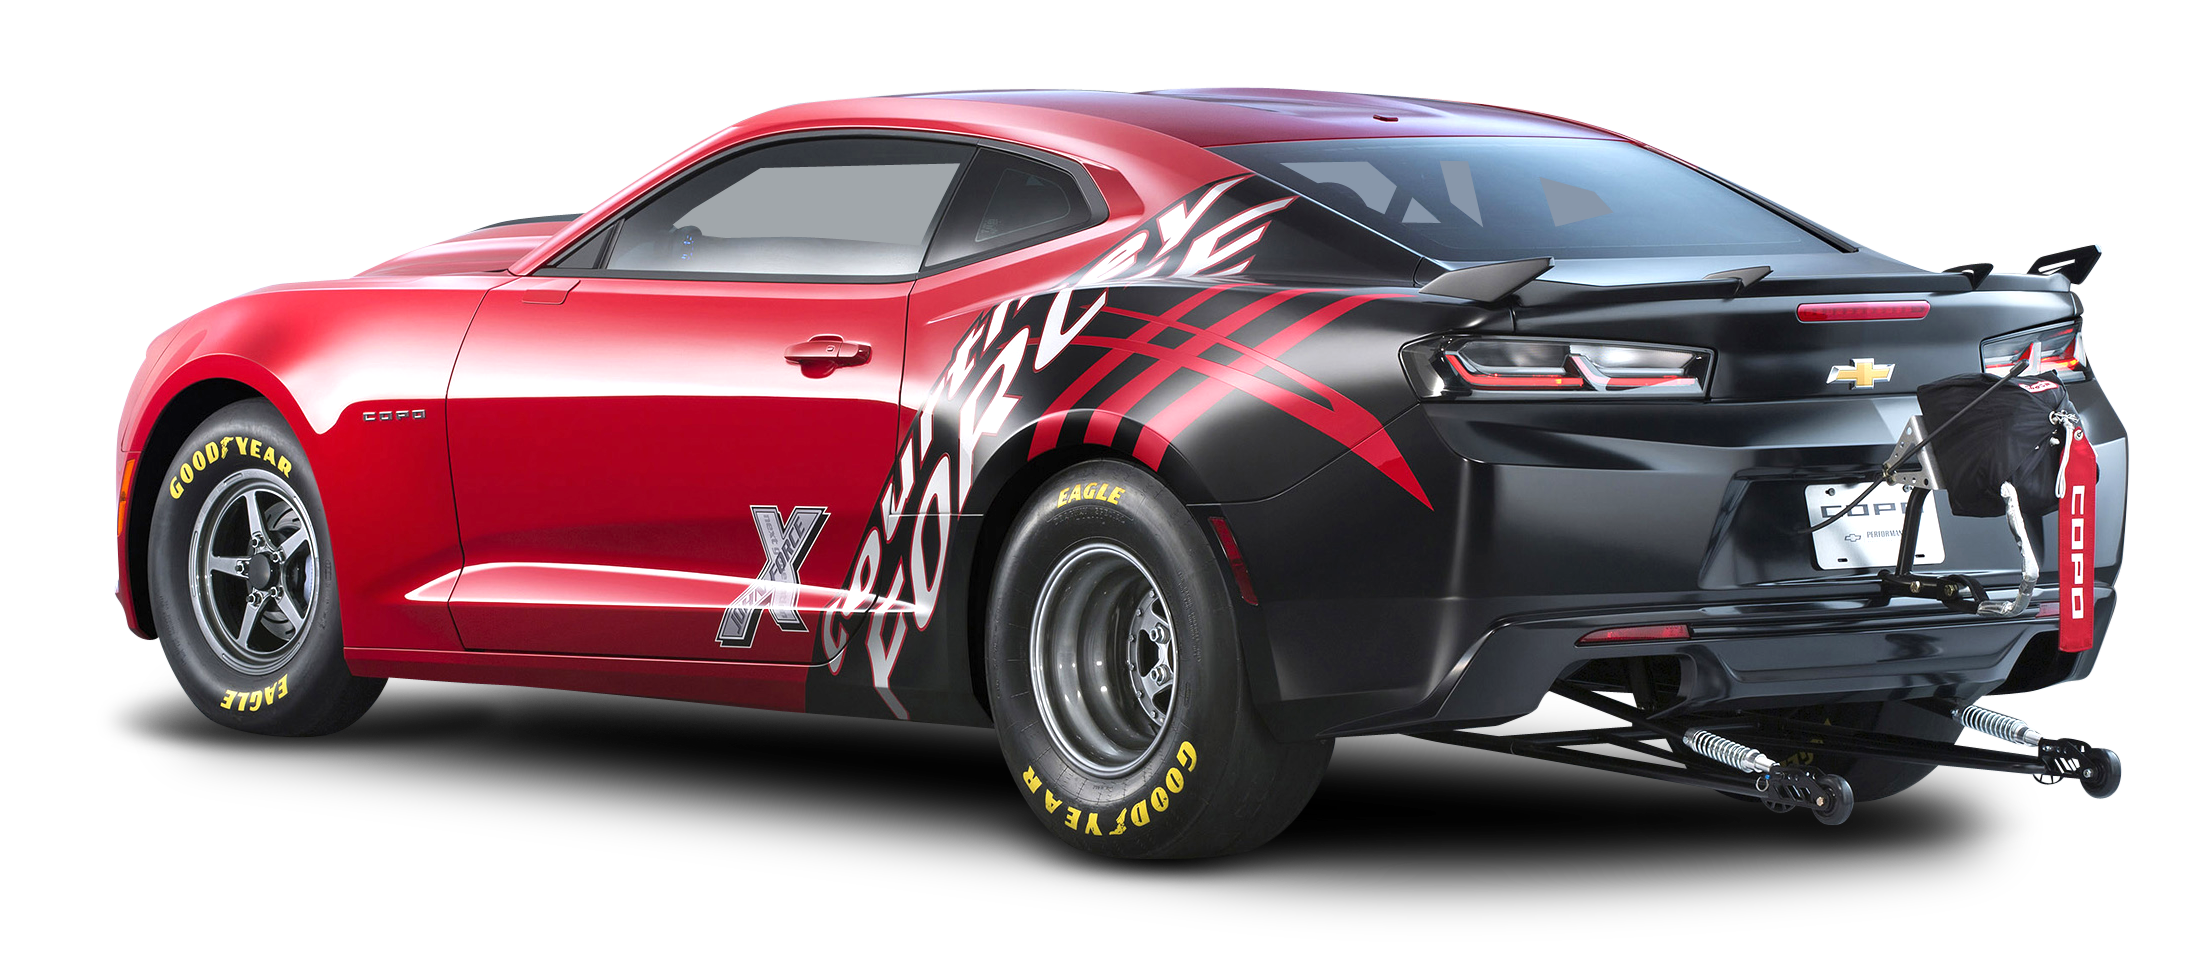 Chevrolet Copo Camaro Red Car Back